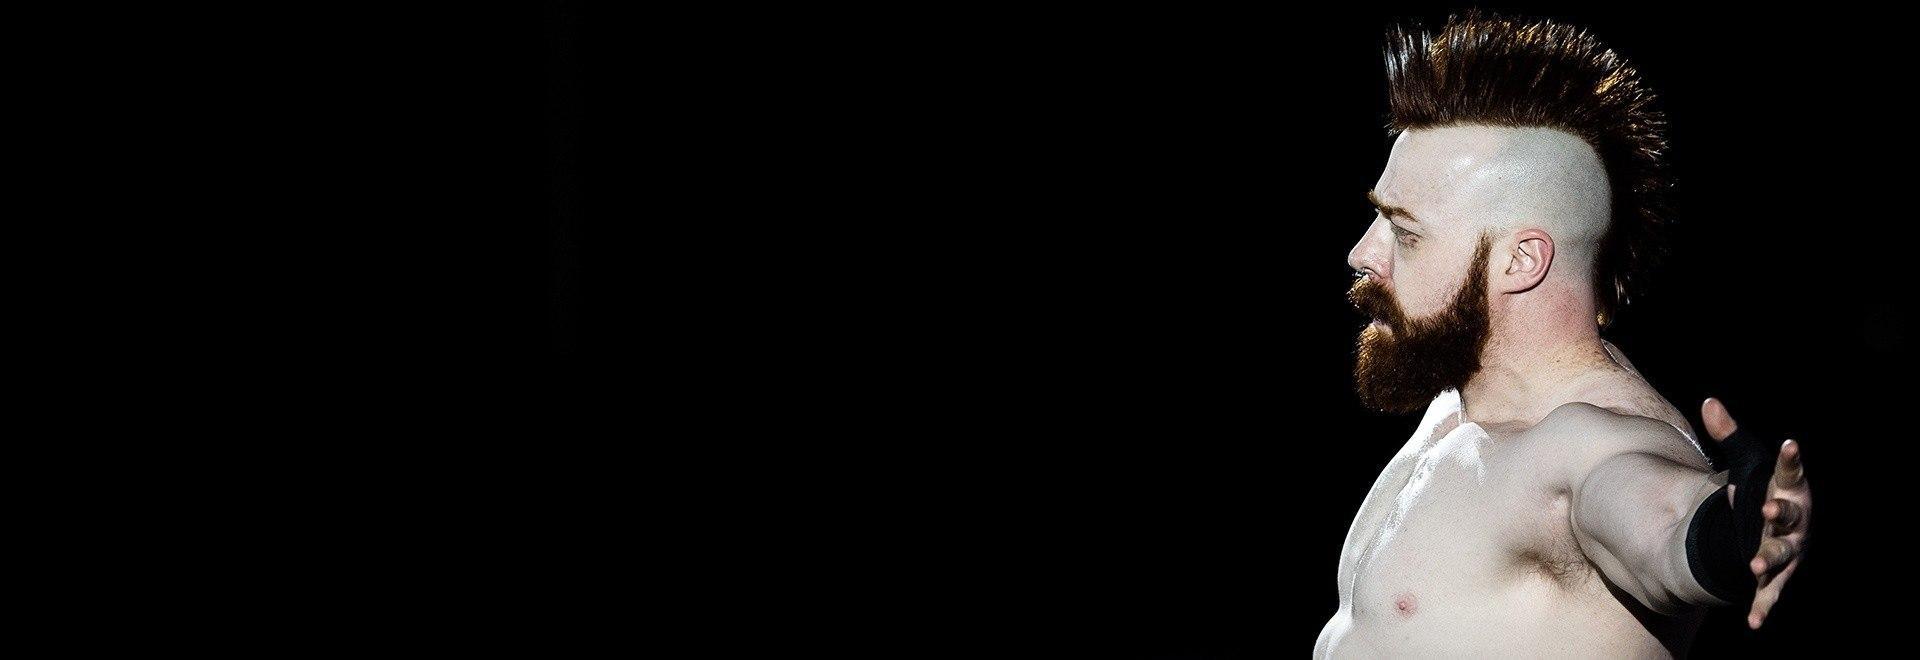 Ep. 257